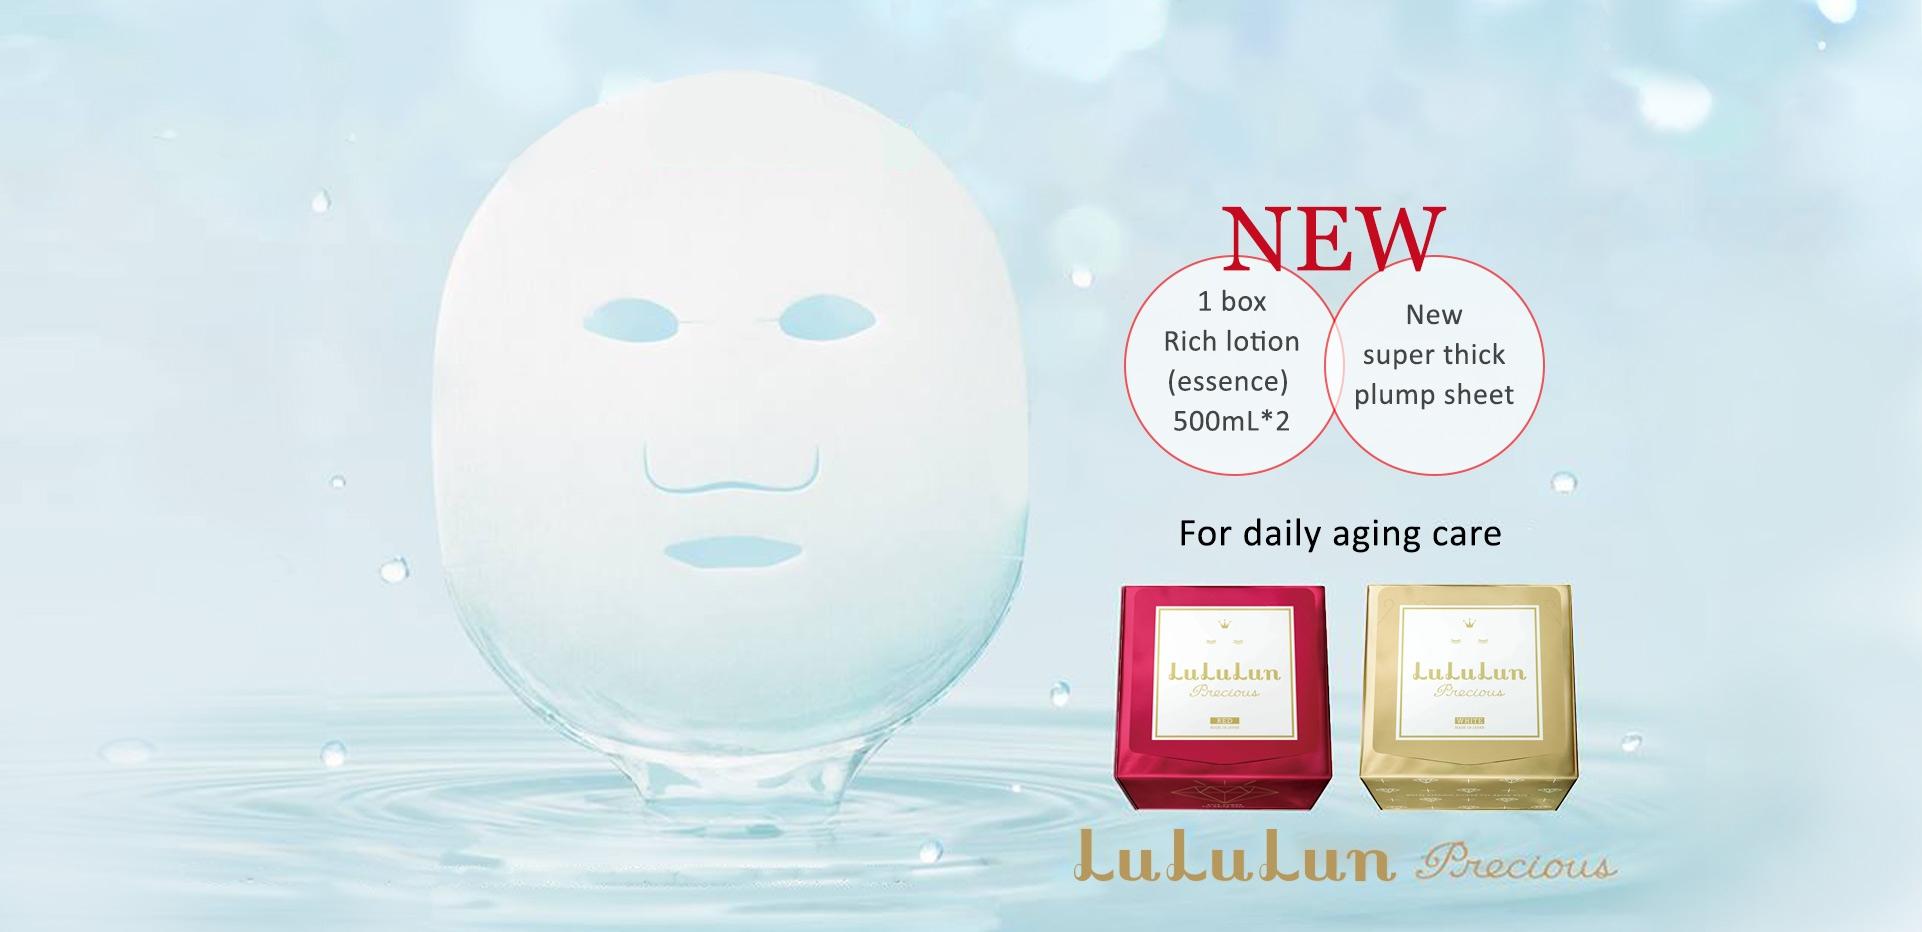 Lululun Precious Series Super Thick